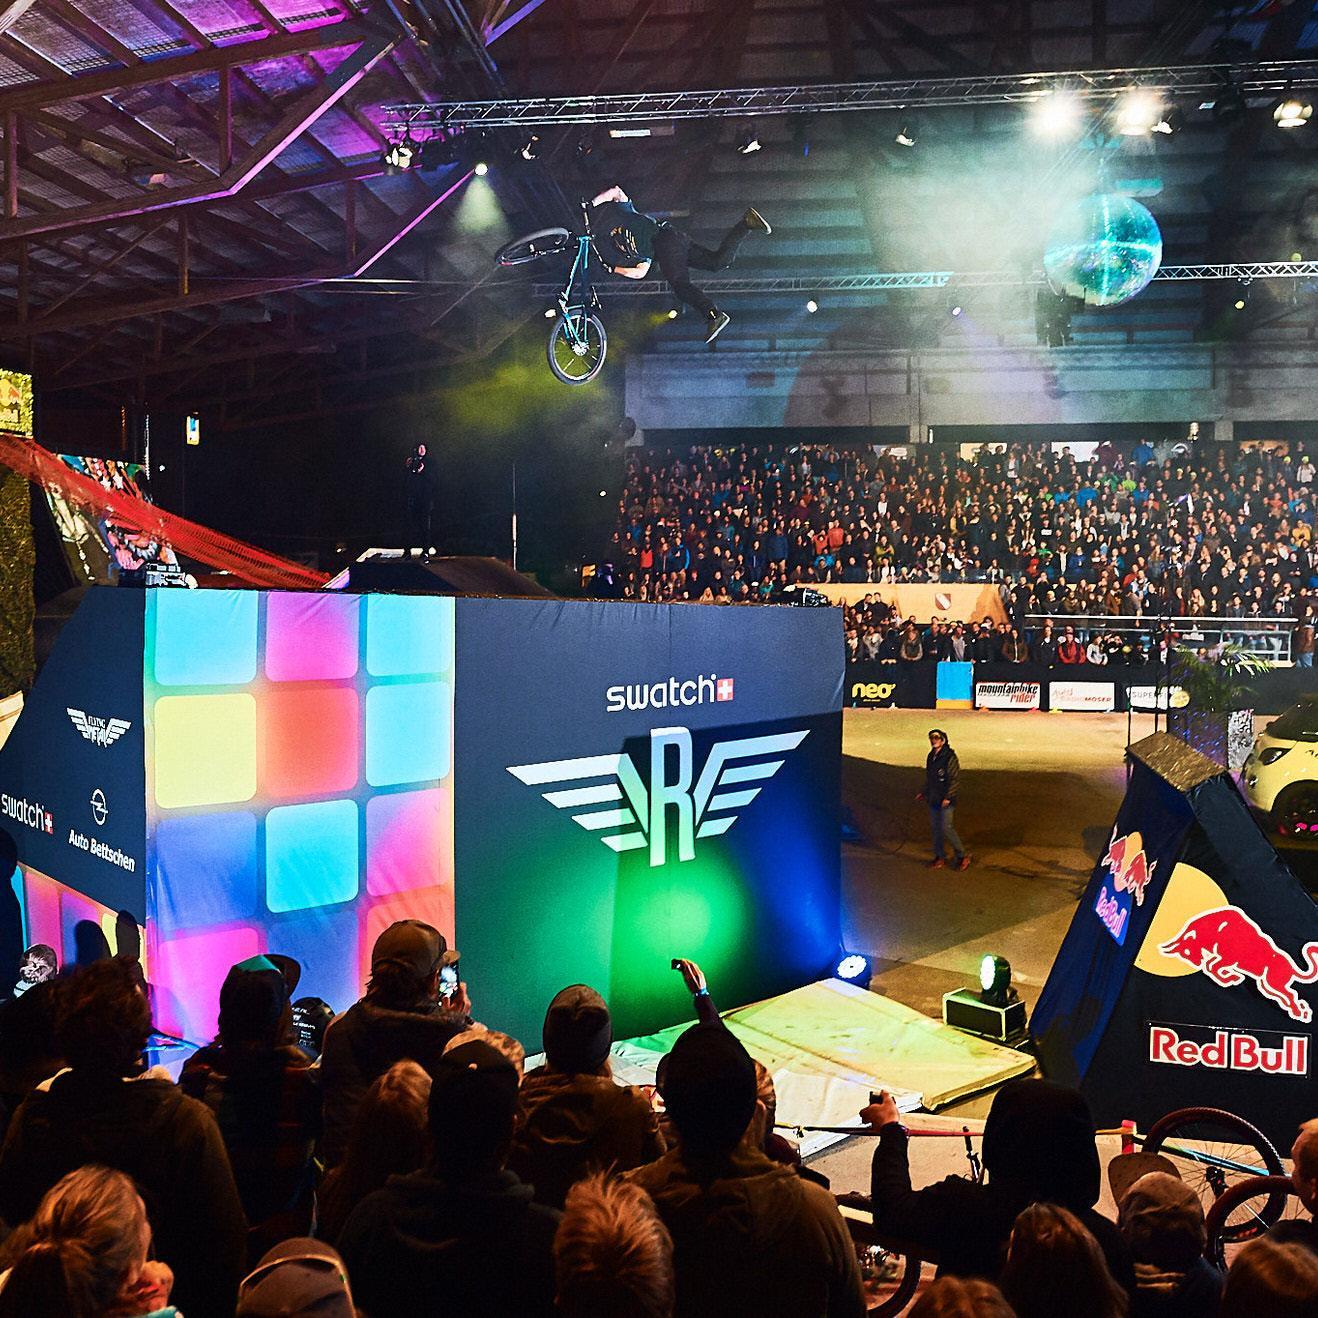 Eventfotografie-Sport-Bike-Event-Swatch-Rocket-Air-Thun